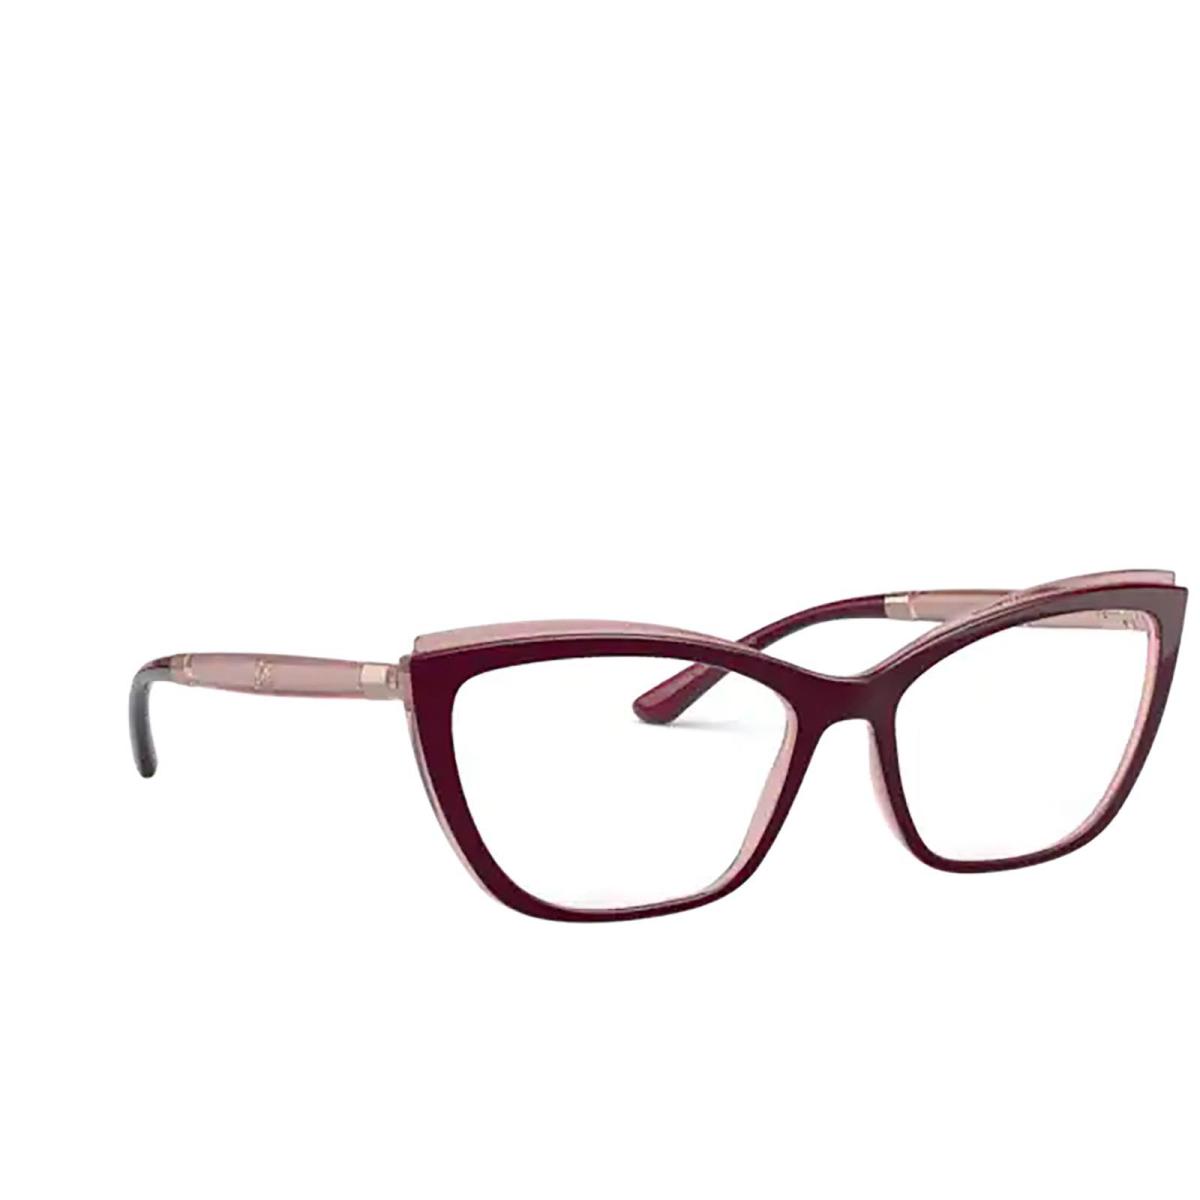 Dolce & Gabbana® Cat-eye Eyeglasses: DG5054 color Bordeaux On Transparent Pink 3247.